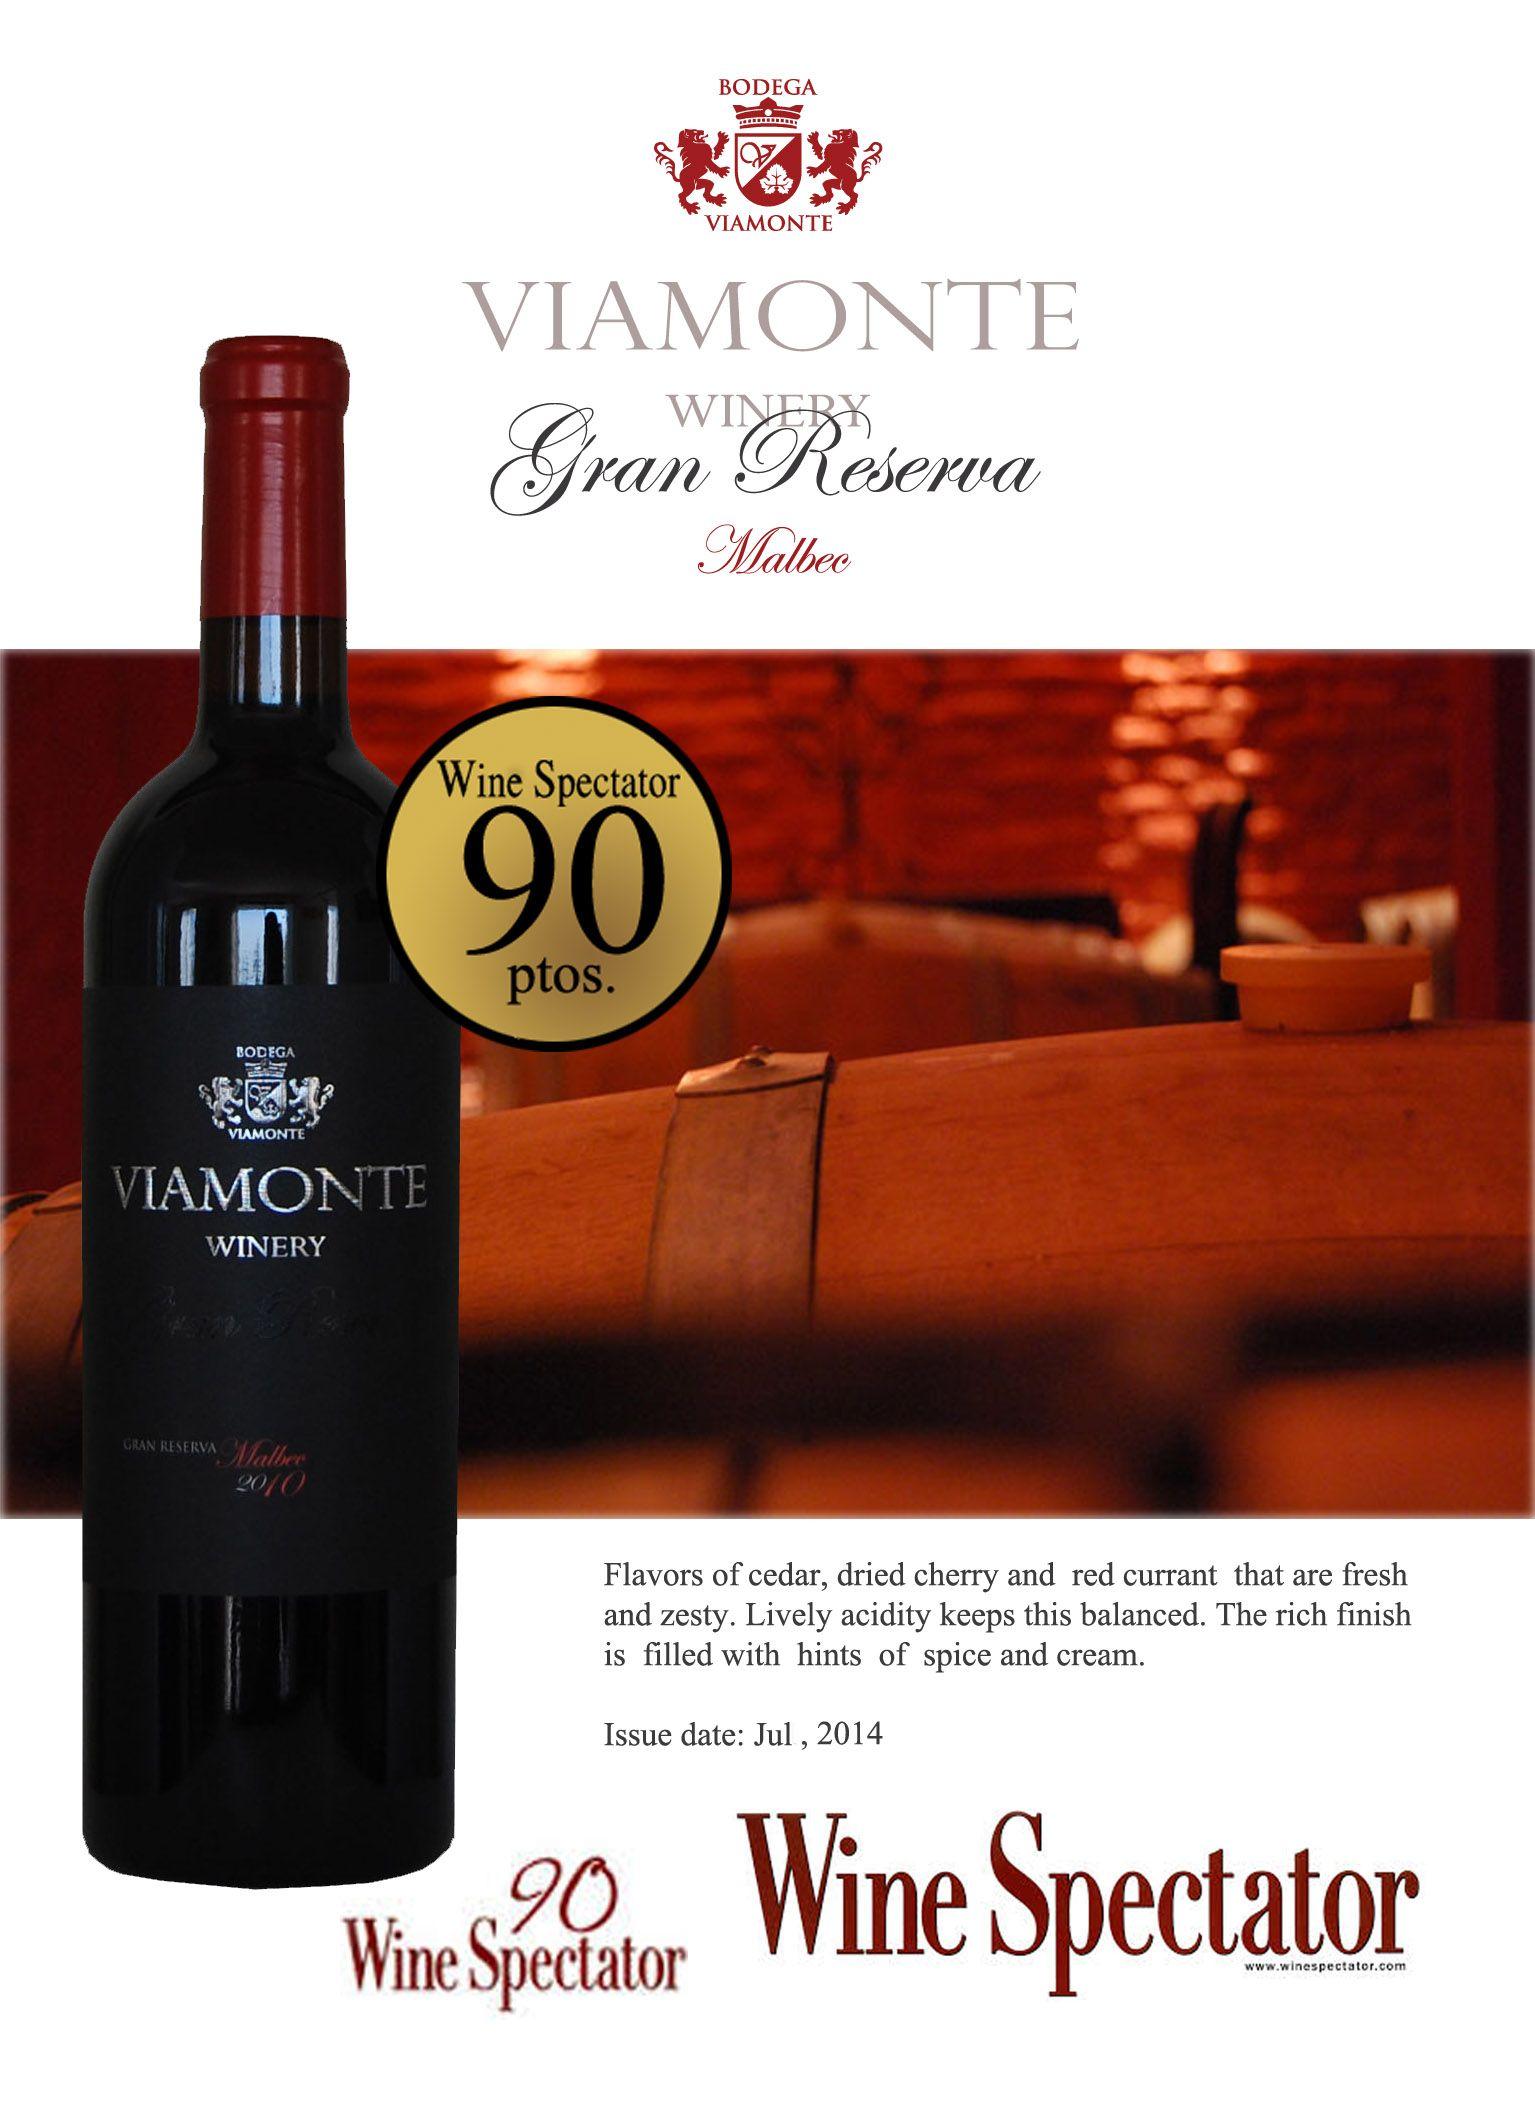 90 Points Wine Spectator Viamonte Gran Reserve Malbec Vistalba Mendoza Argentina Bodegas Enologo